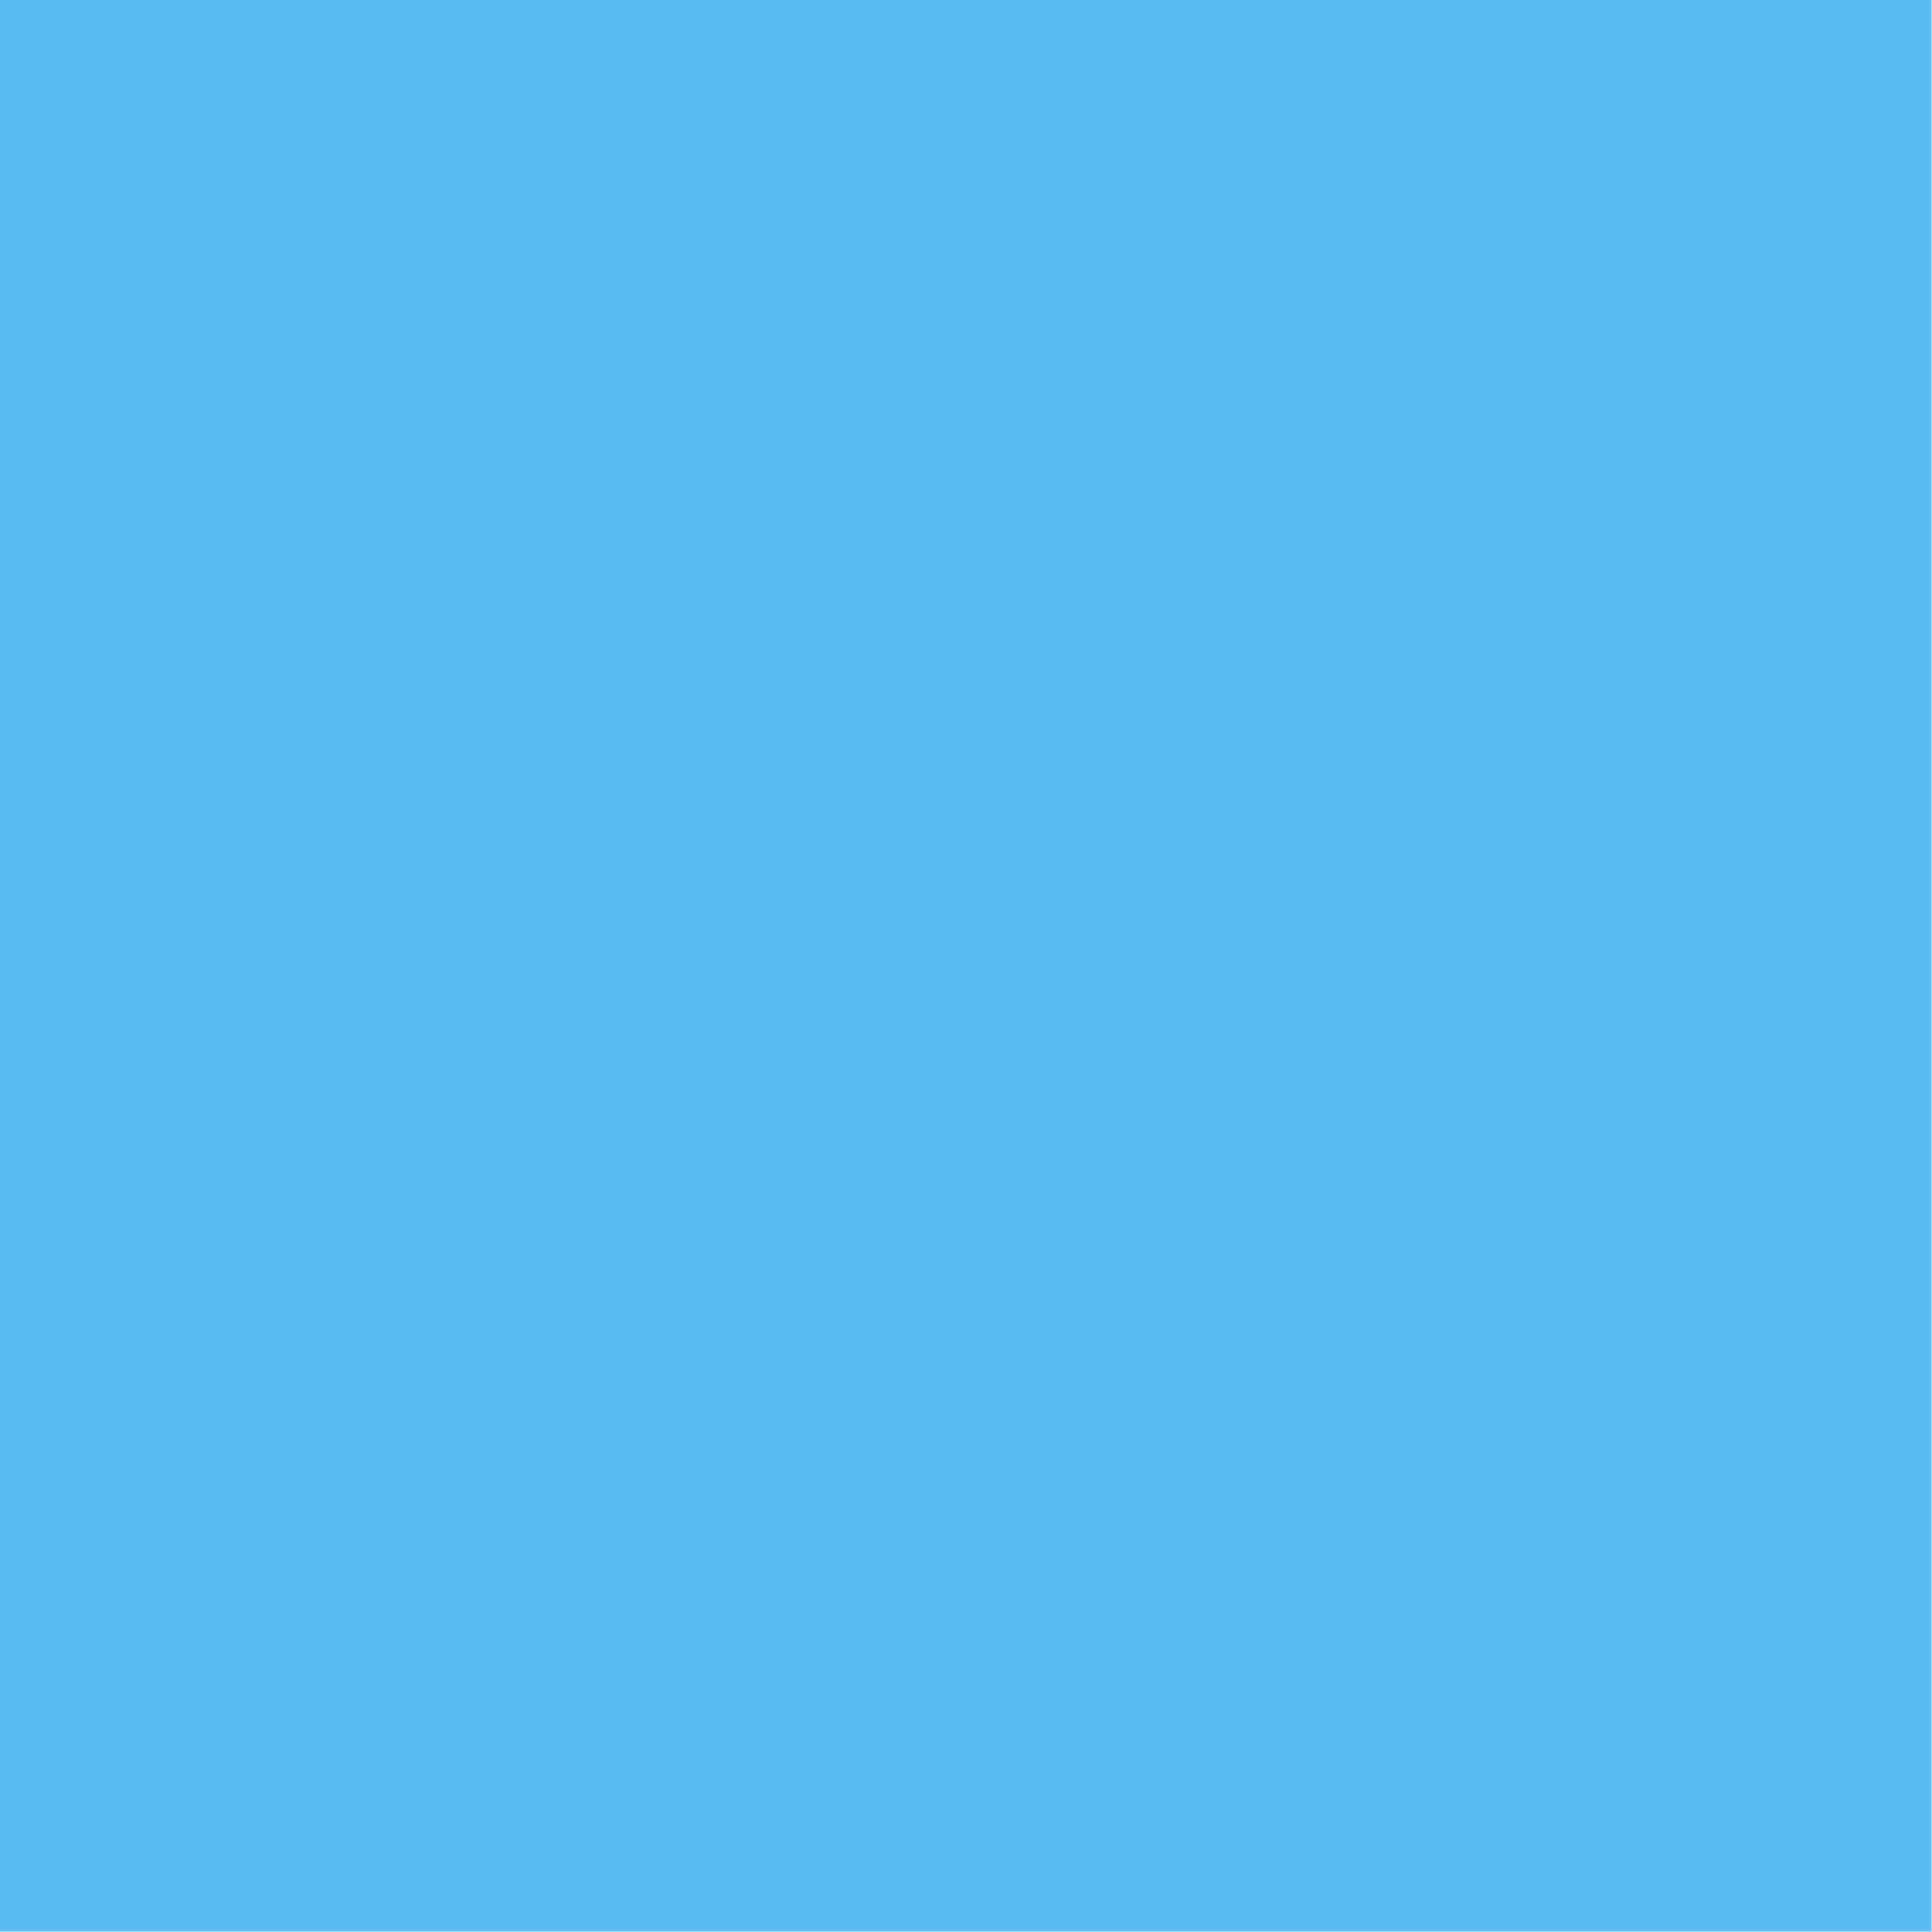 26. Picton Blue